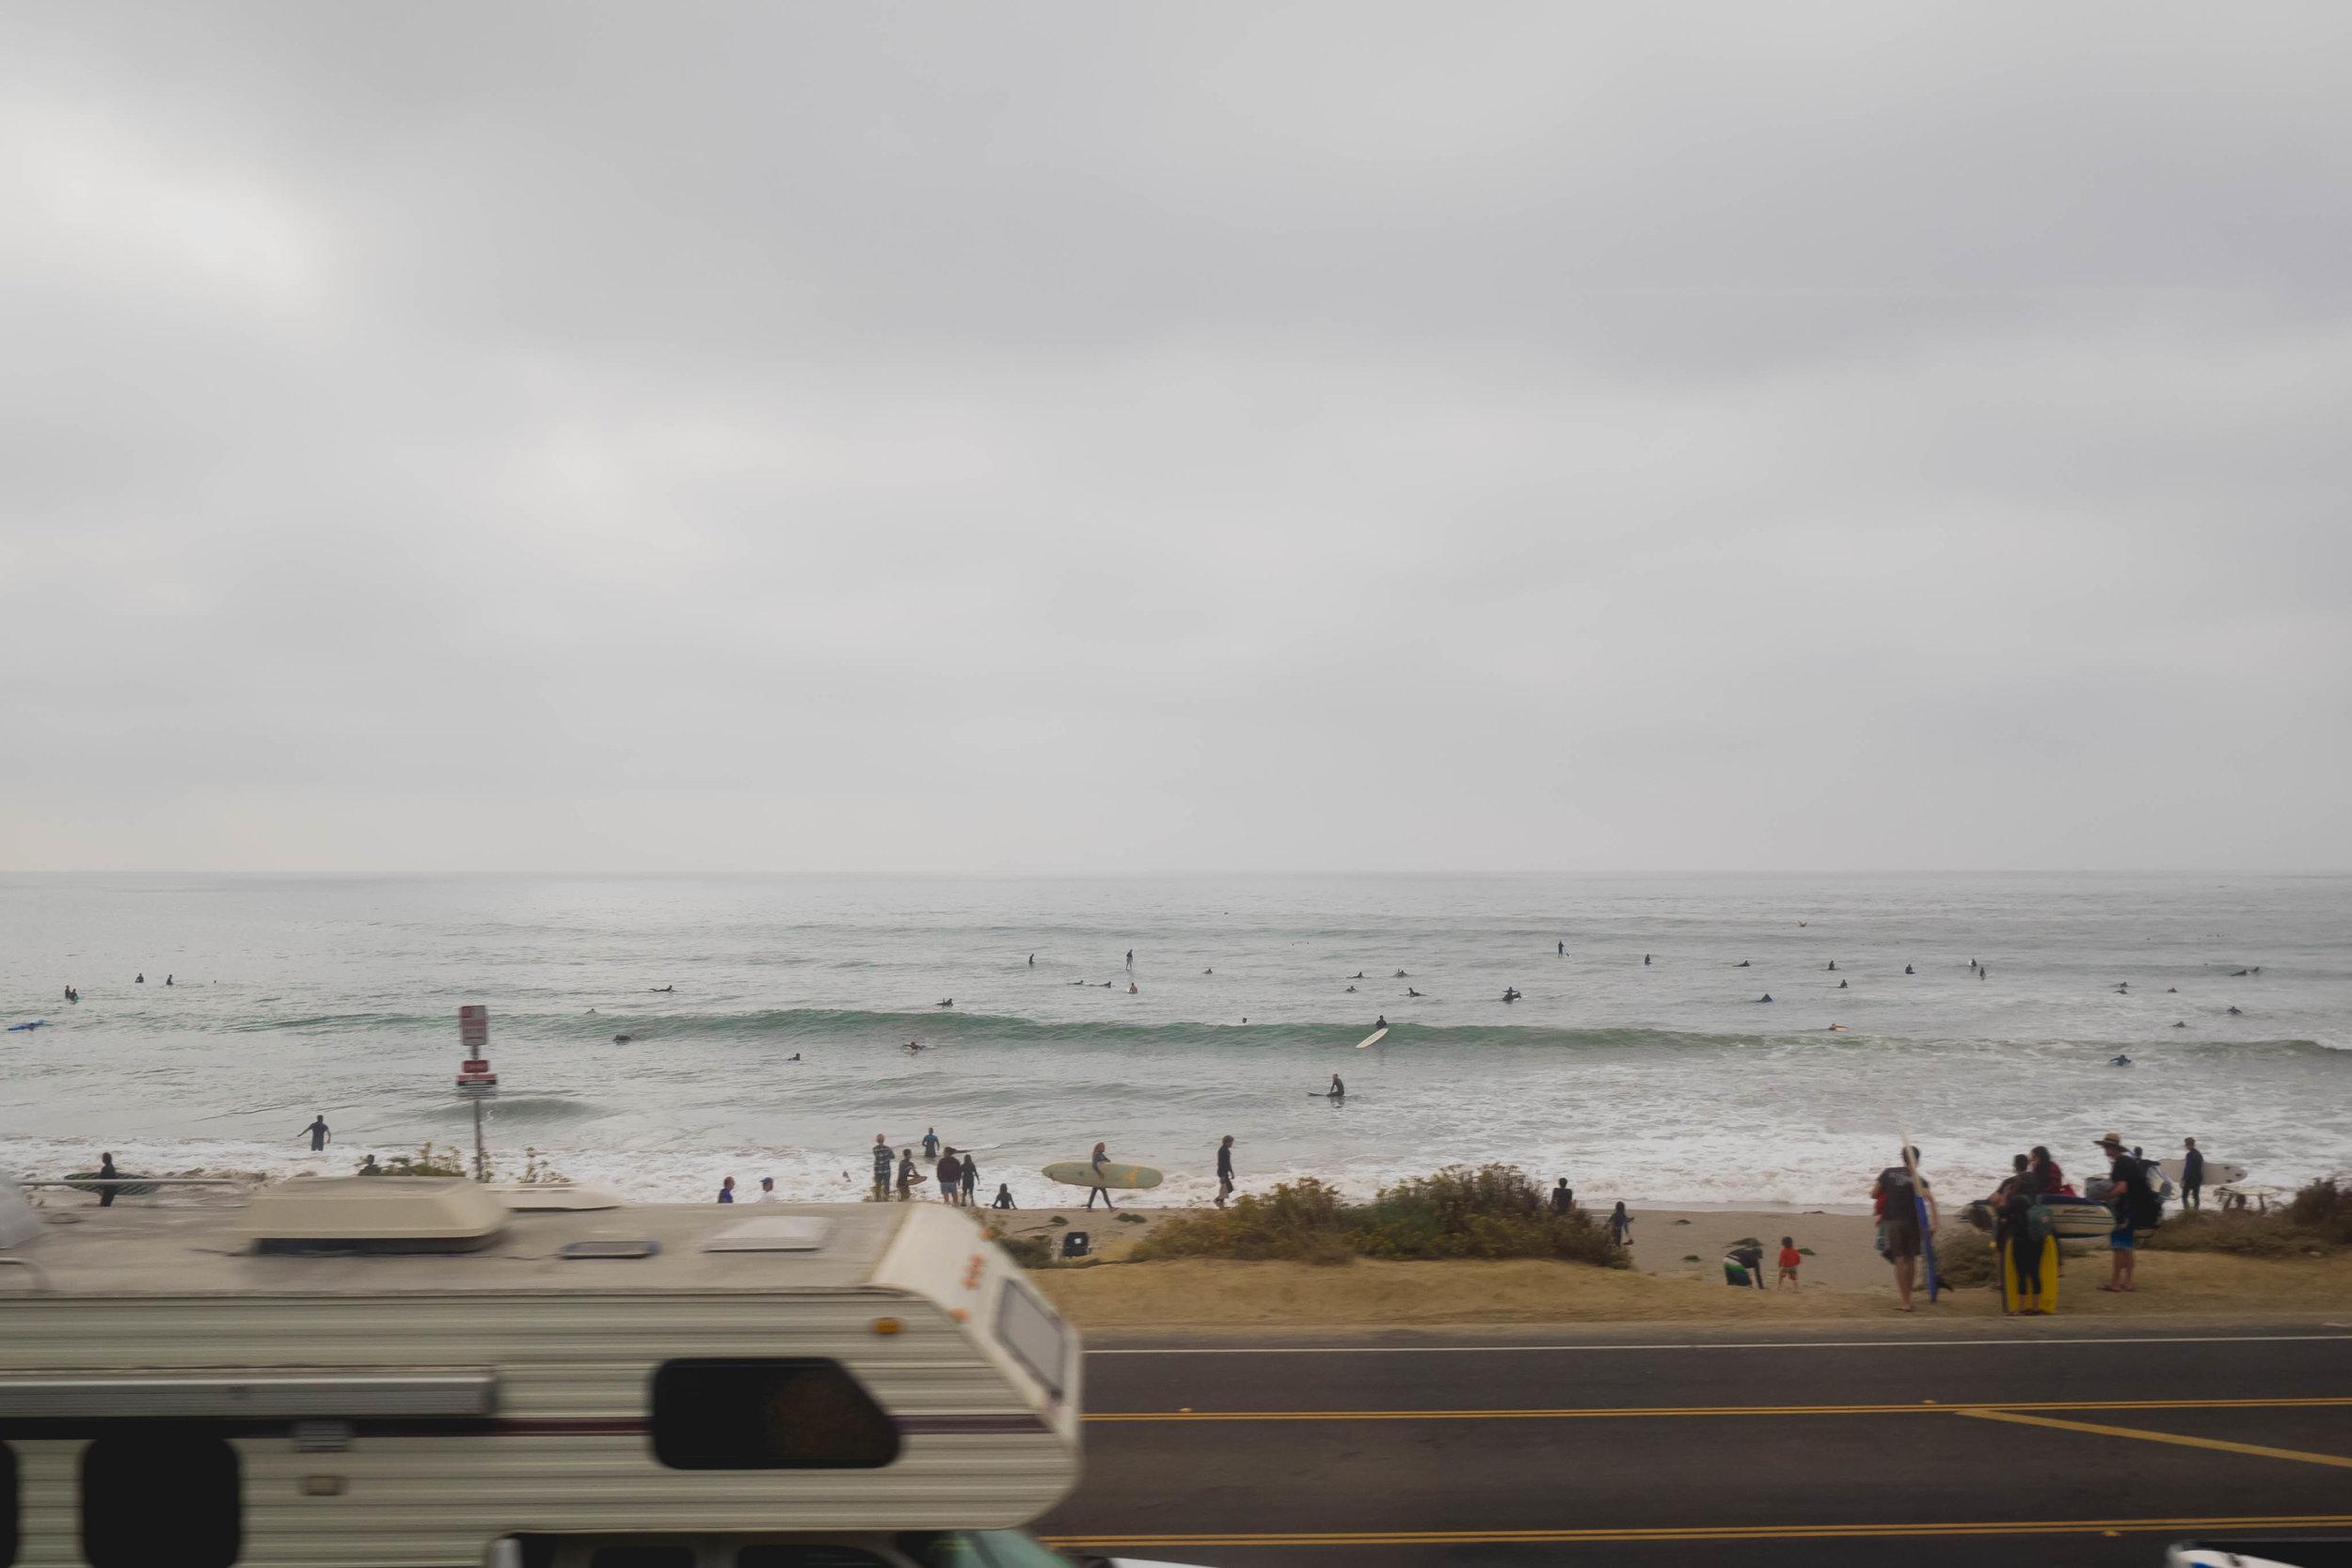 passing a popular surf spot.